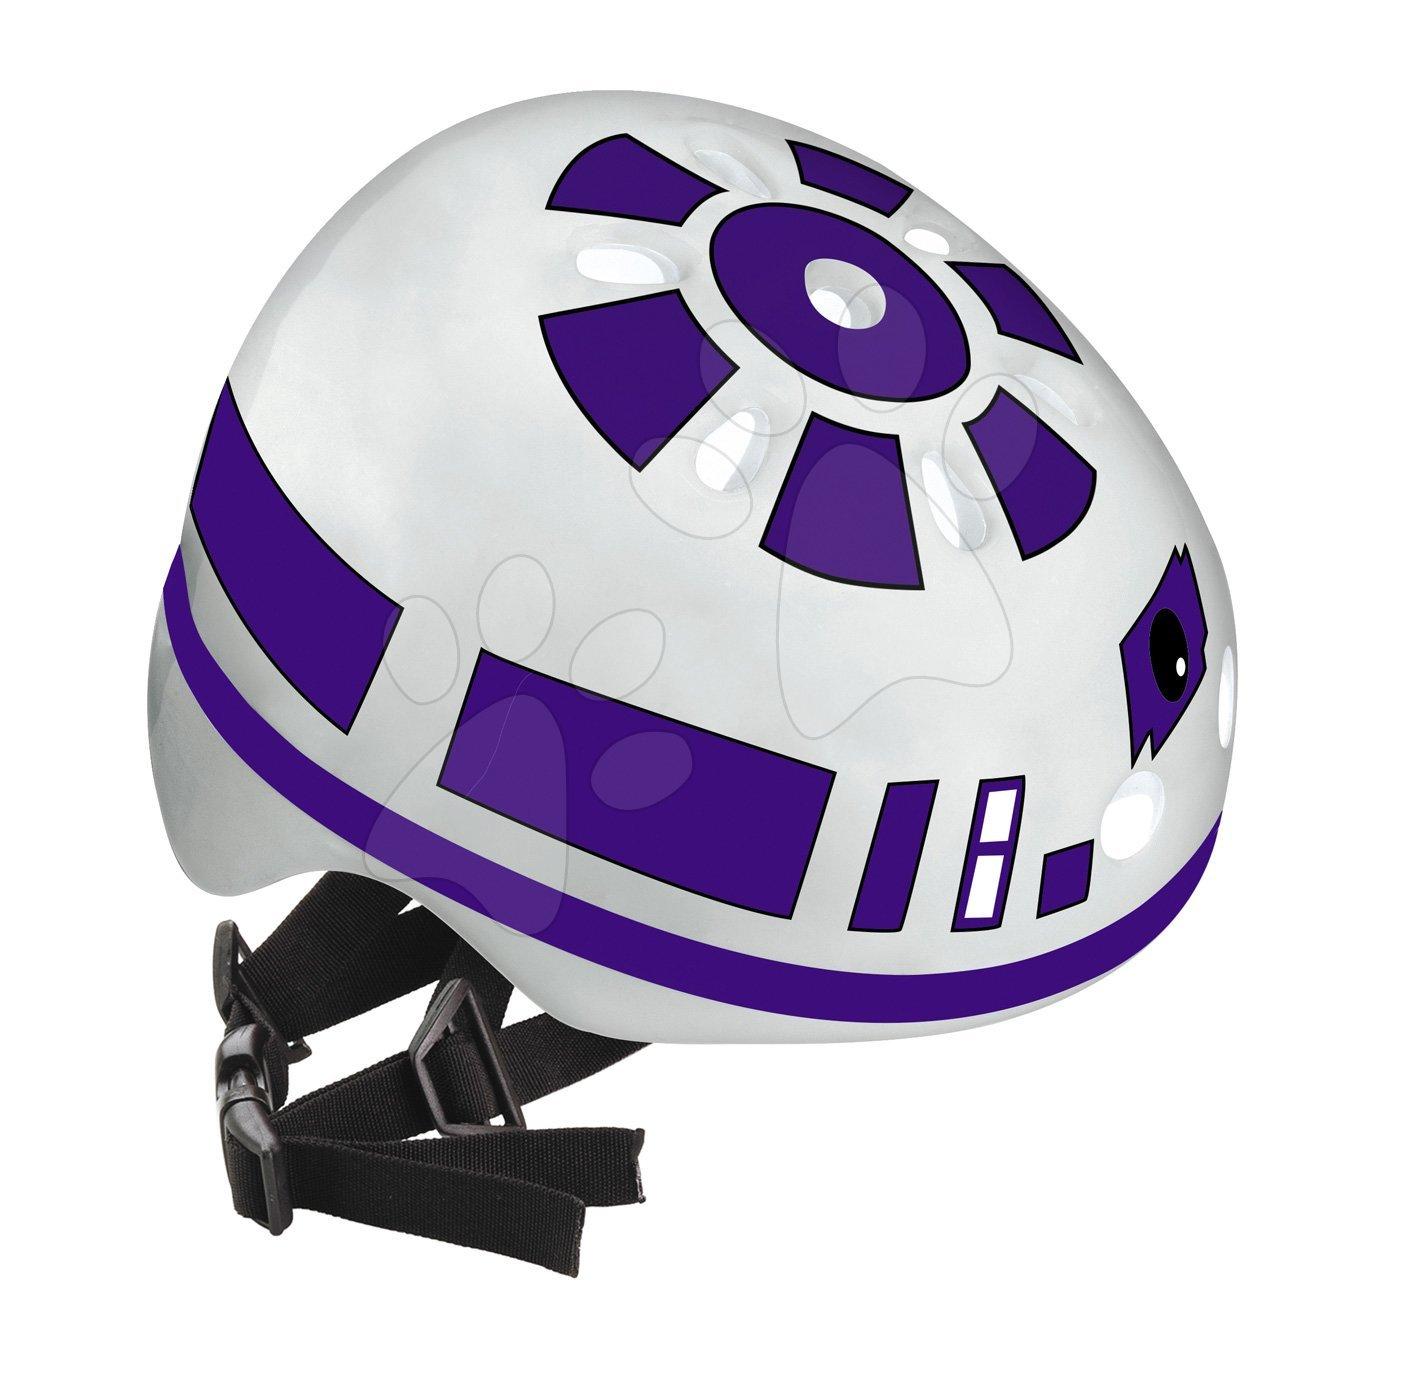 Mondo dětská helma Star Wars 28168